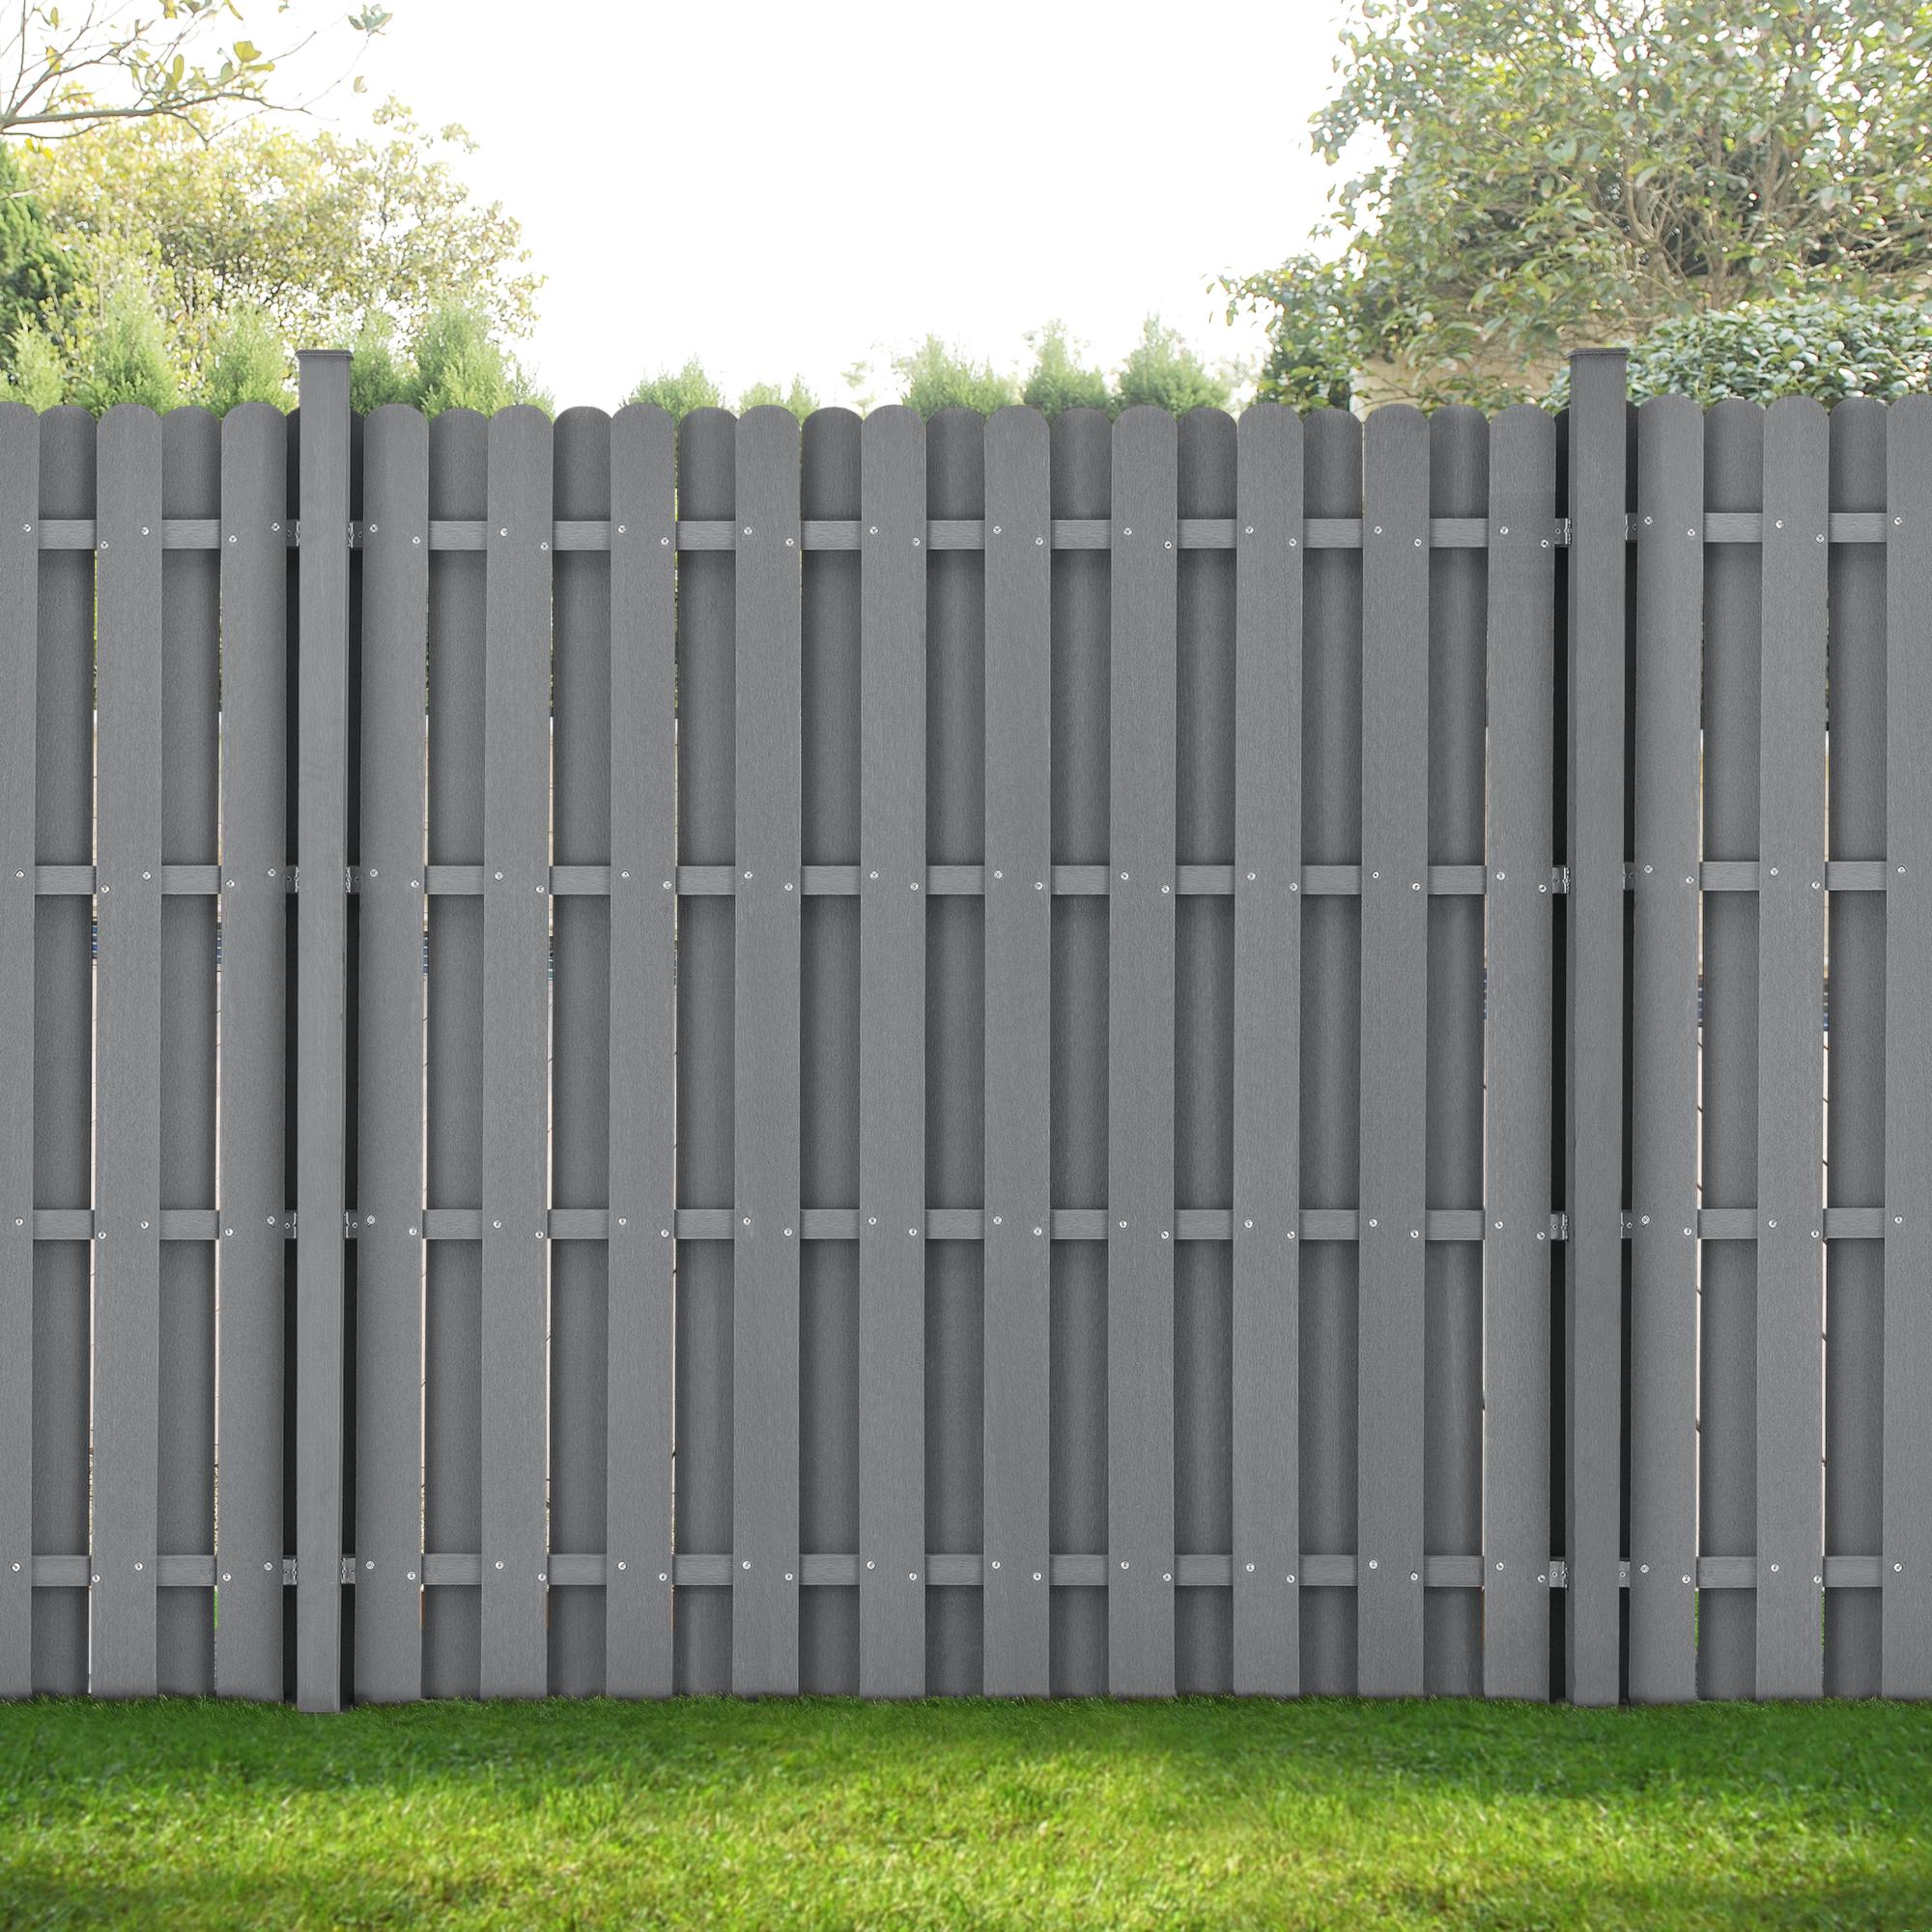 Neu Holz Wpc Gartenzaun Sichtschutzzaun Windschutz Lamellenzaun